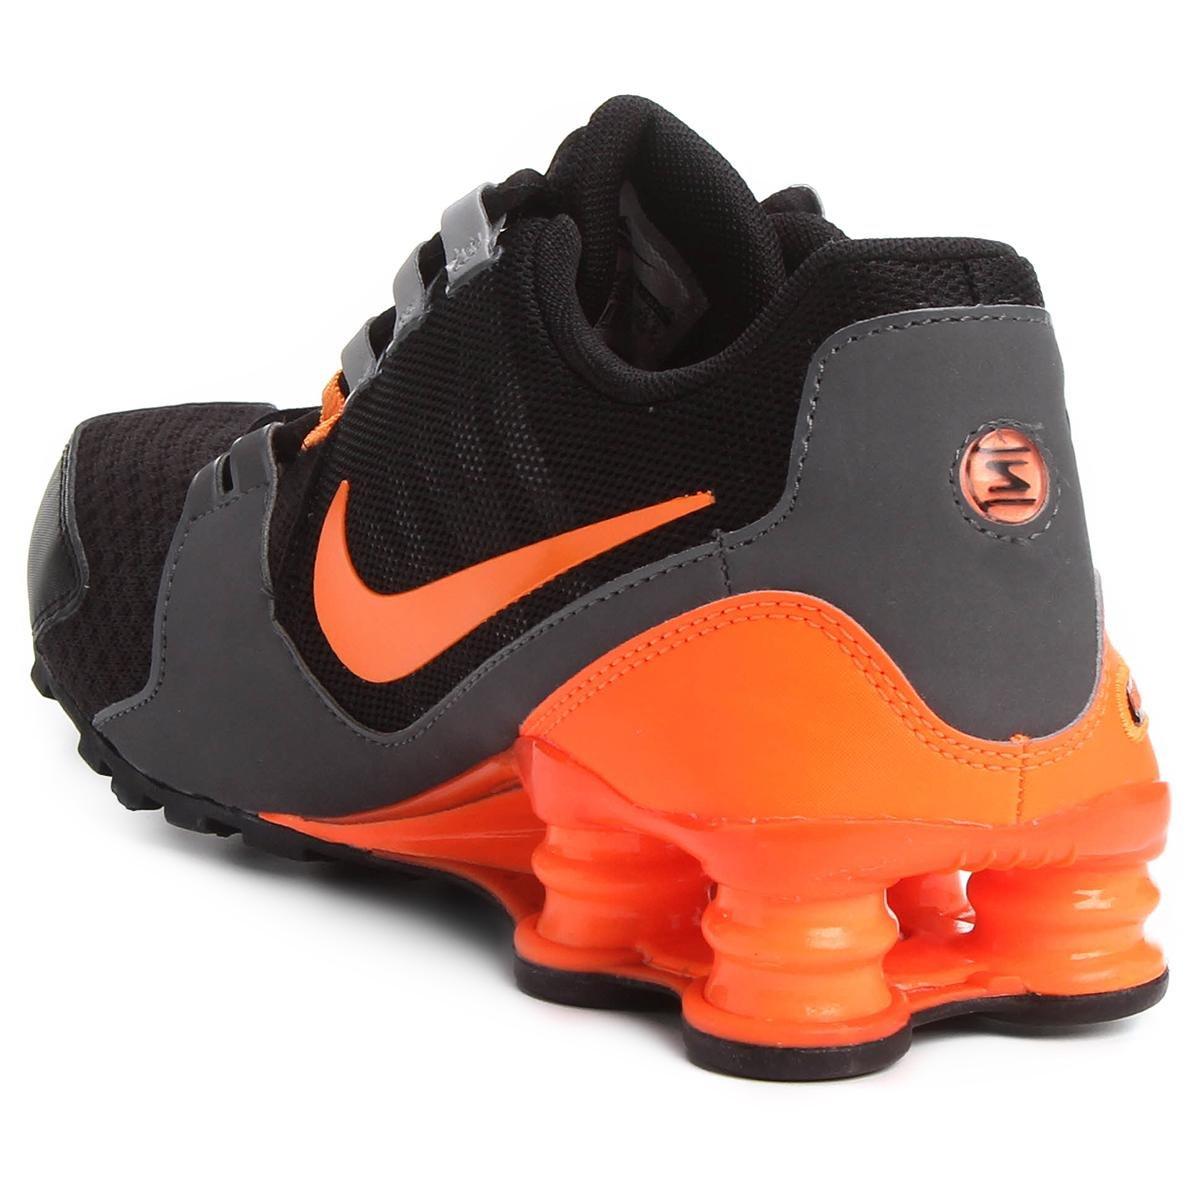 42df0fa672 Tênis Nike Shox Avenue Masculino - Preto e Laranja ...